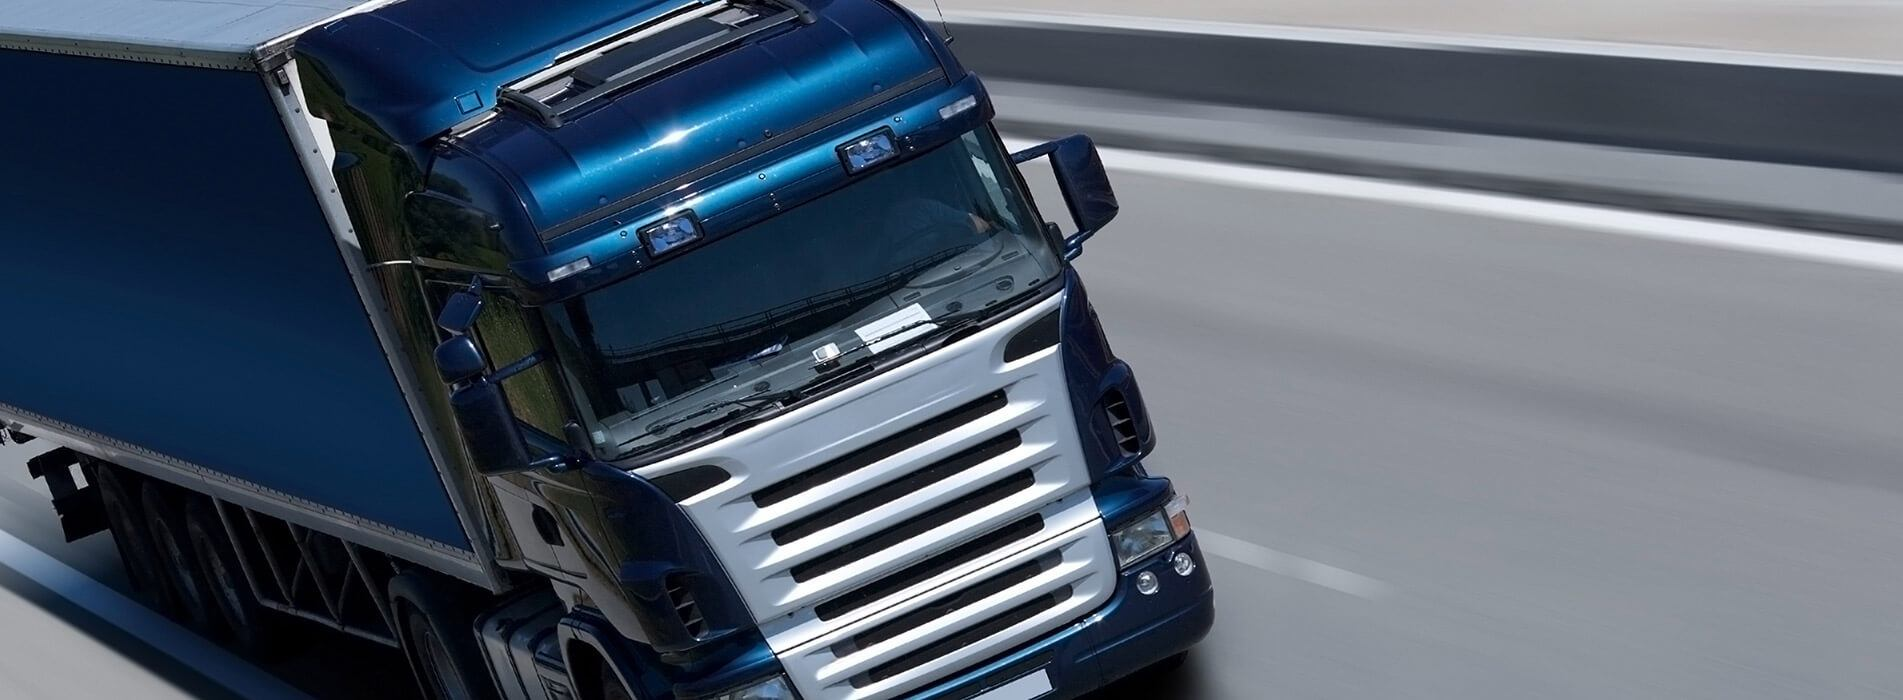 Header - Μεταφορές με Φορτηγό